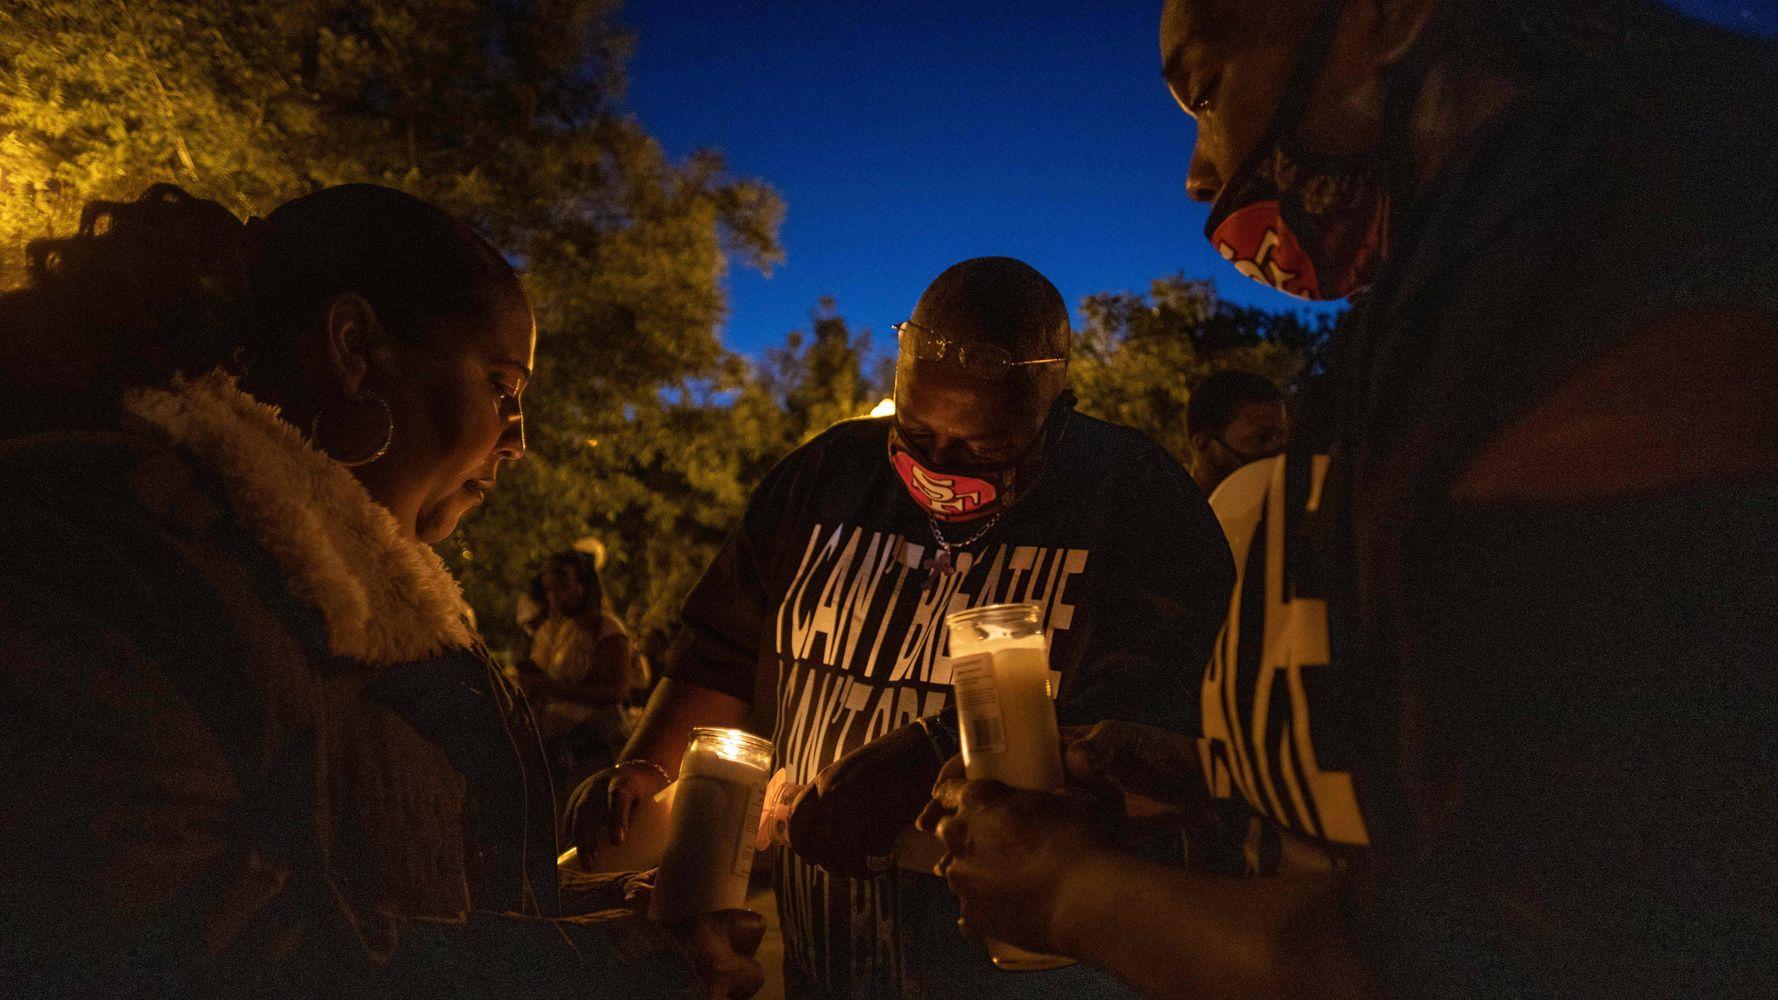 Authorities Investigate Hanging Death Of Black Man; Second In Region In 2 Weeks